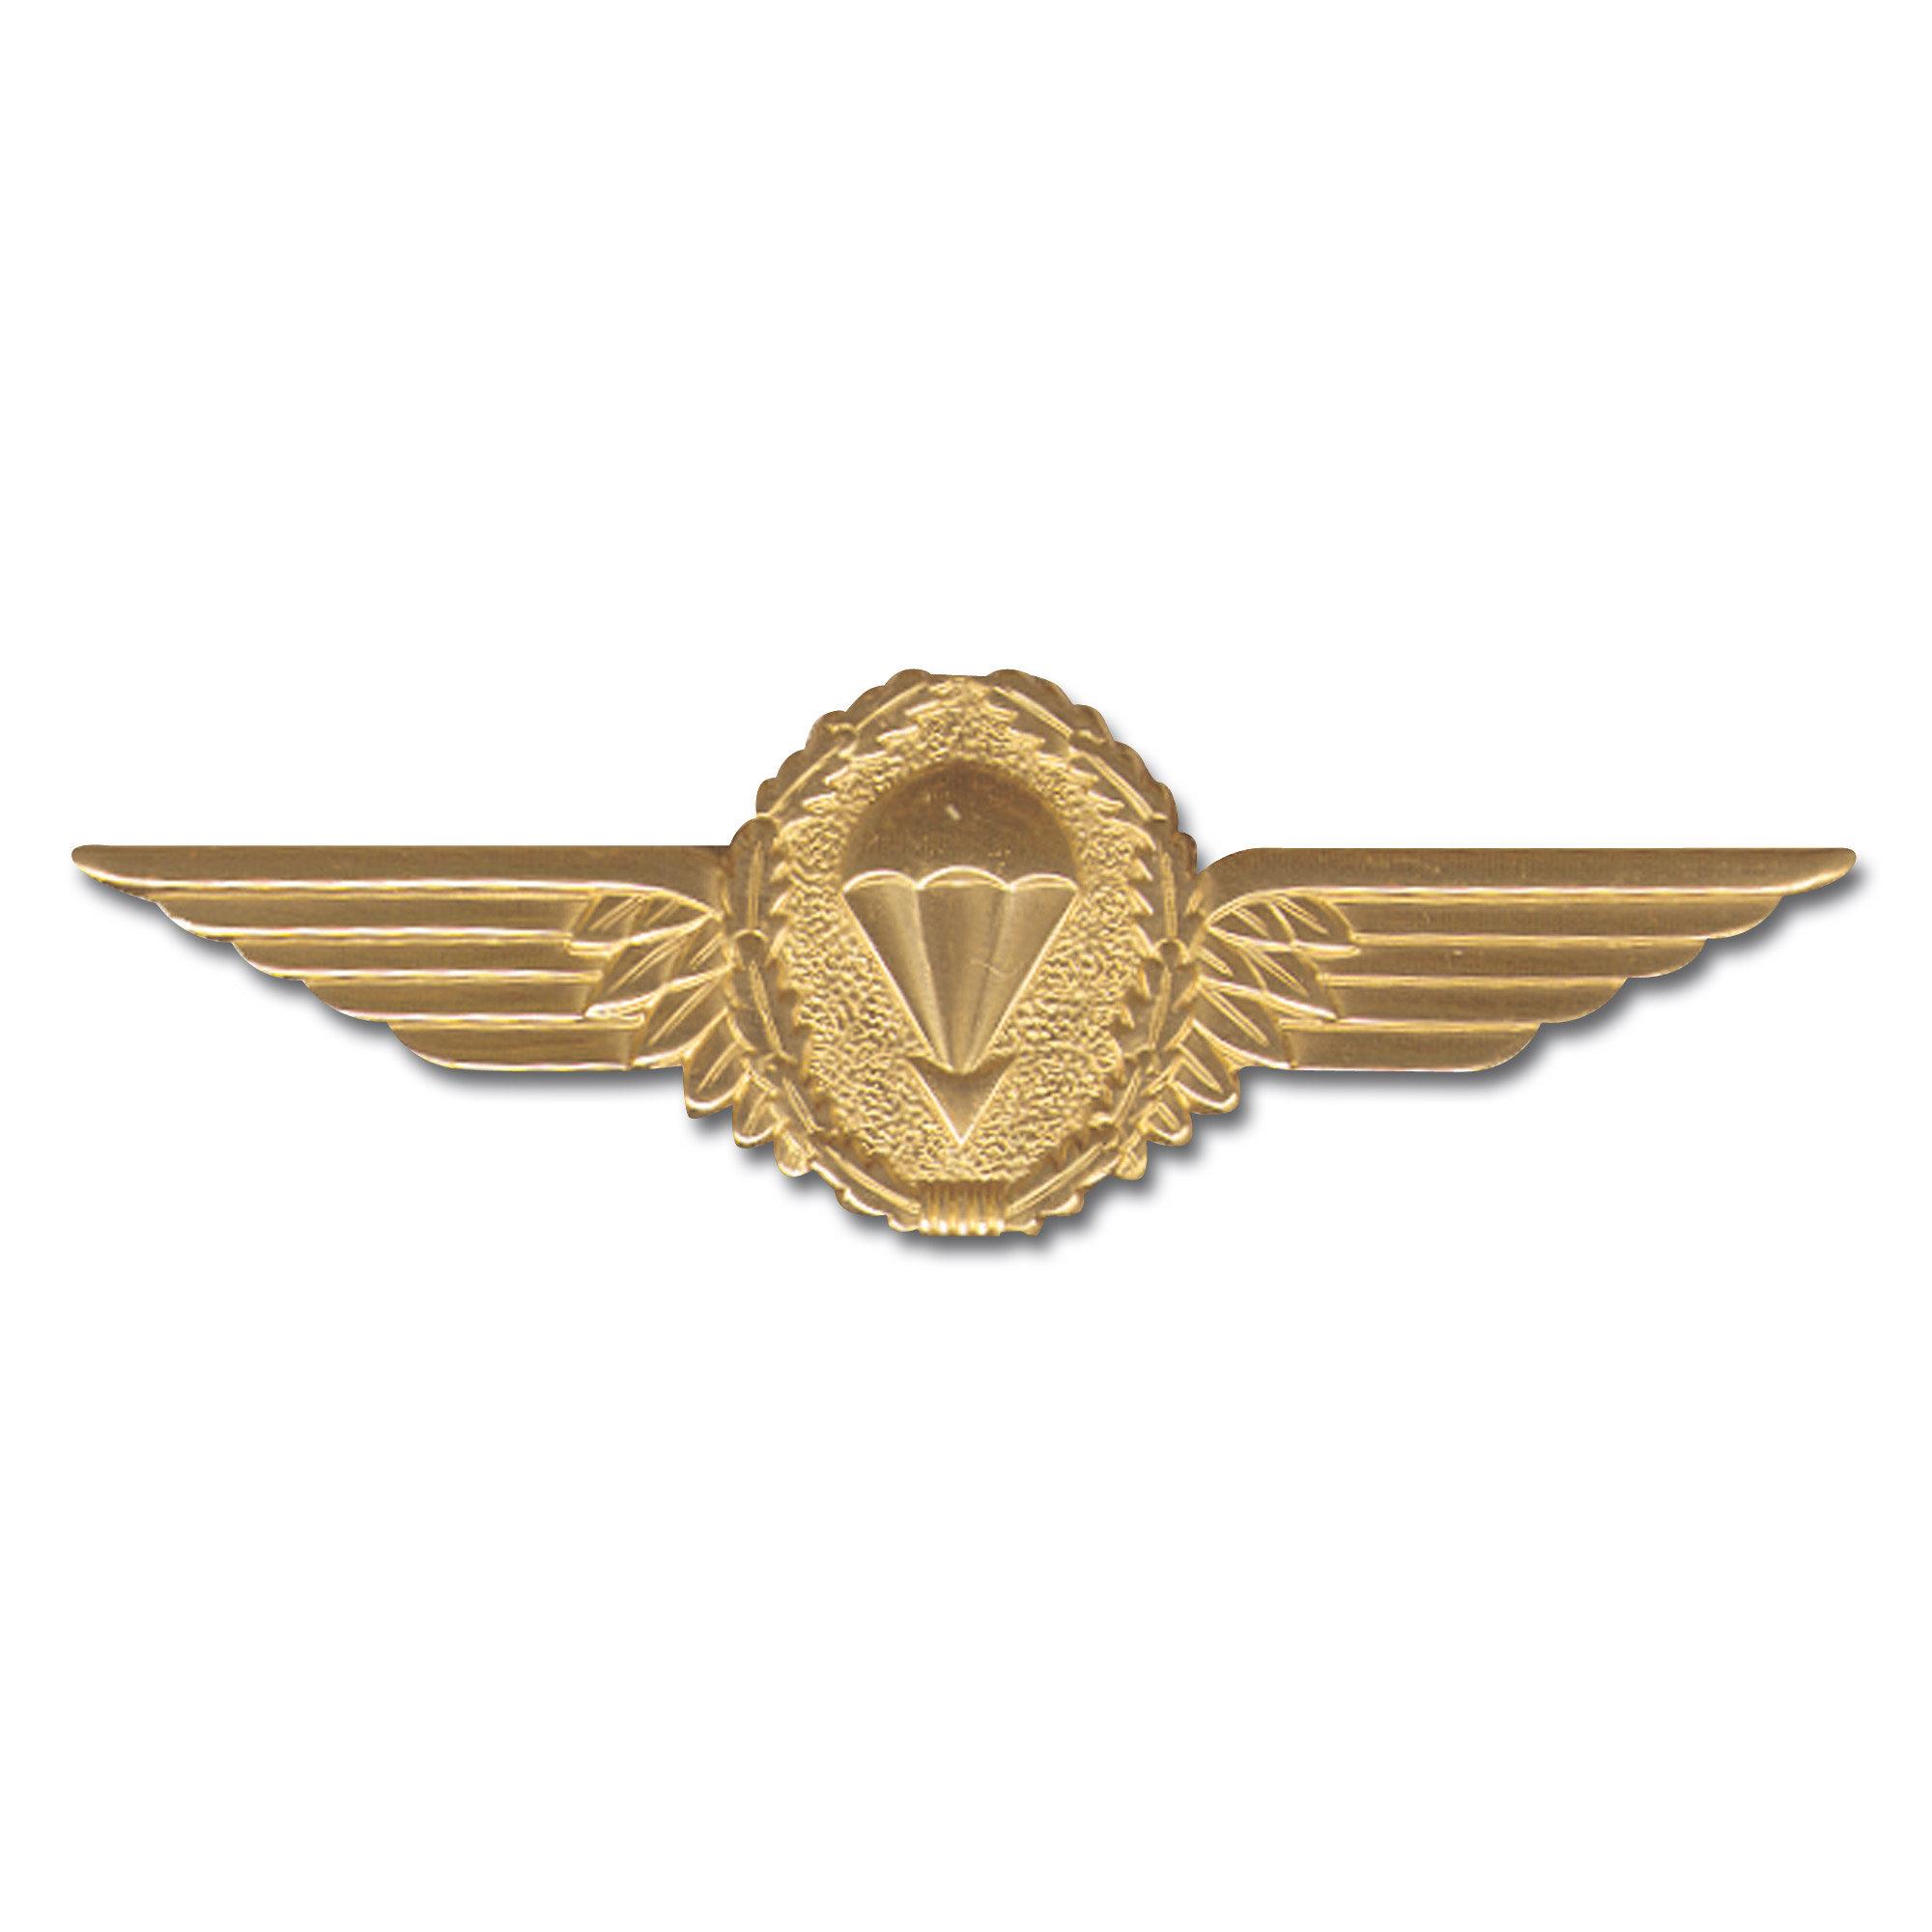 Abzeichen BW Fallschirmspringer gold Metall